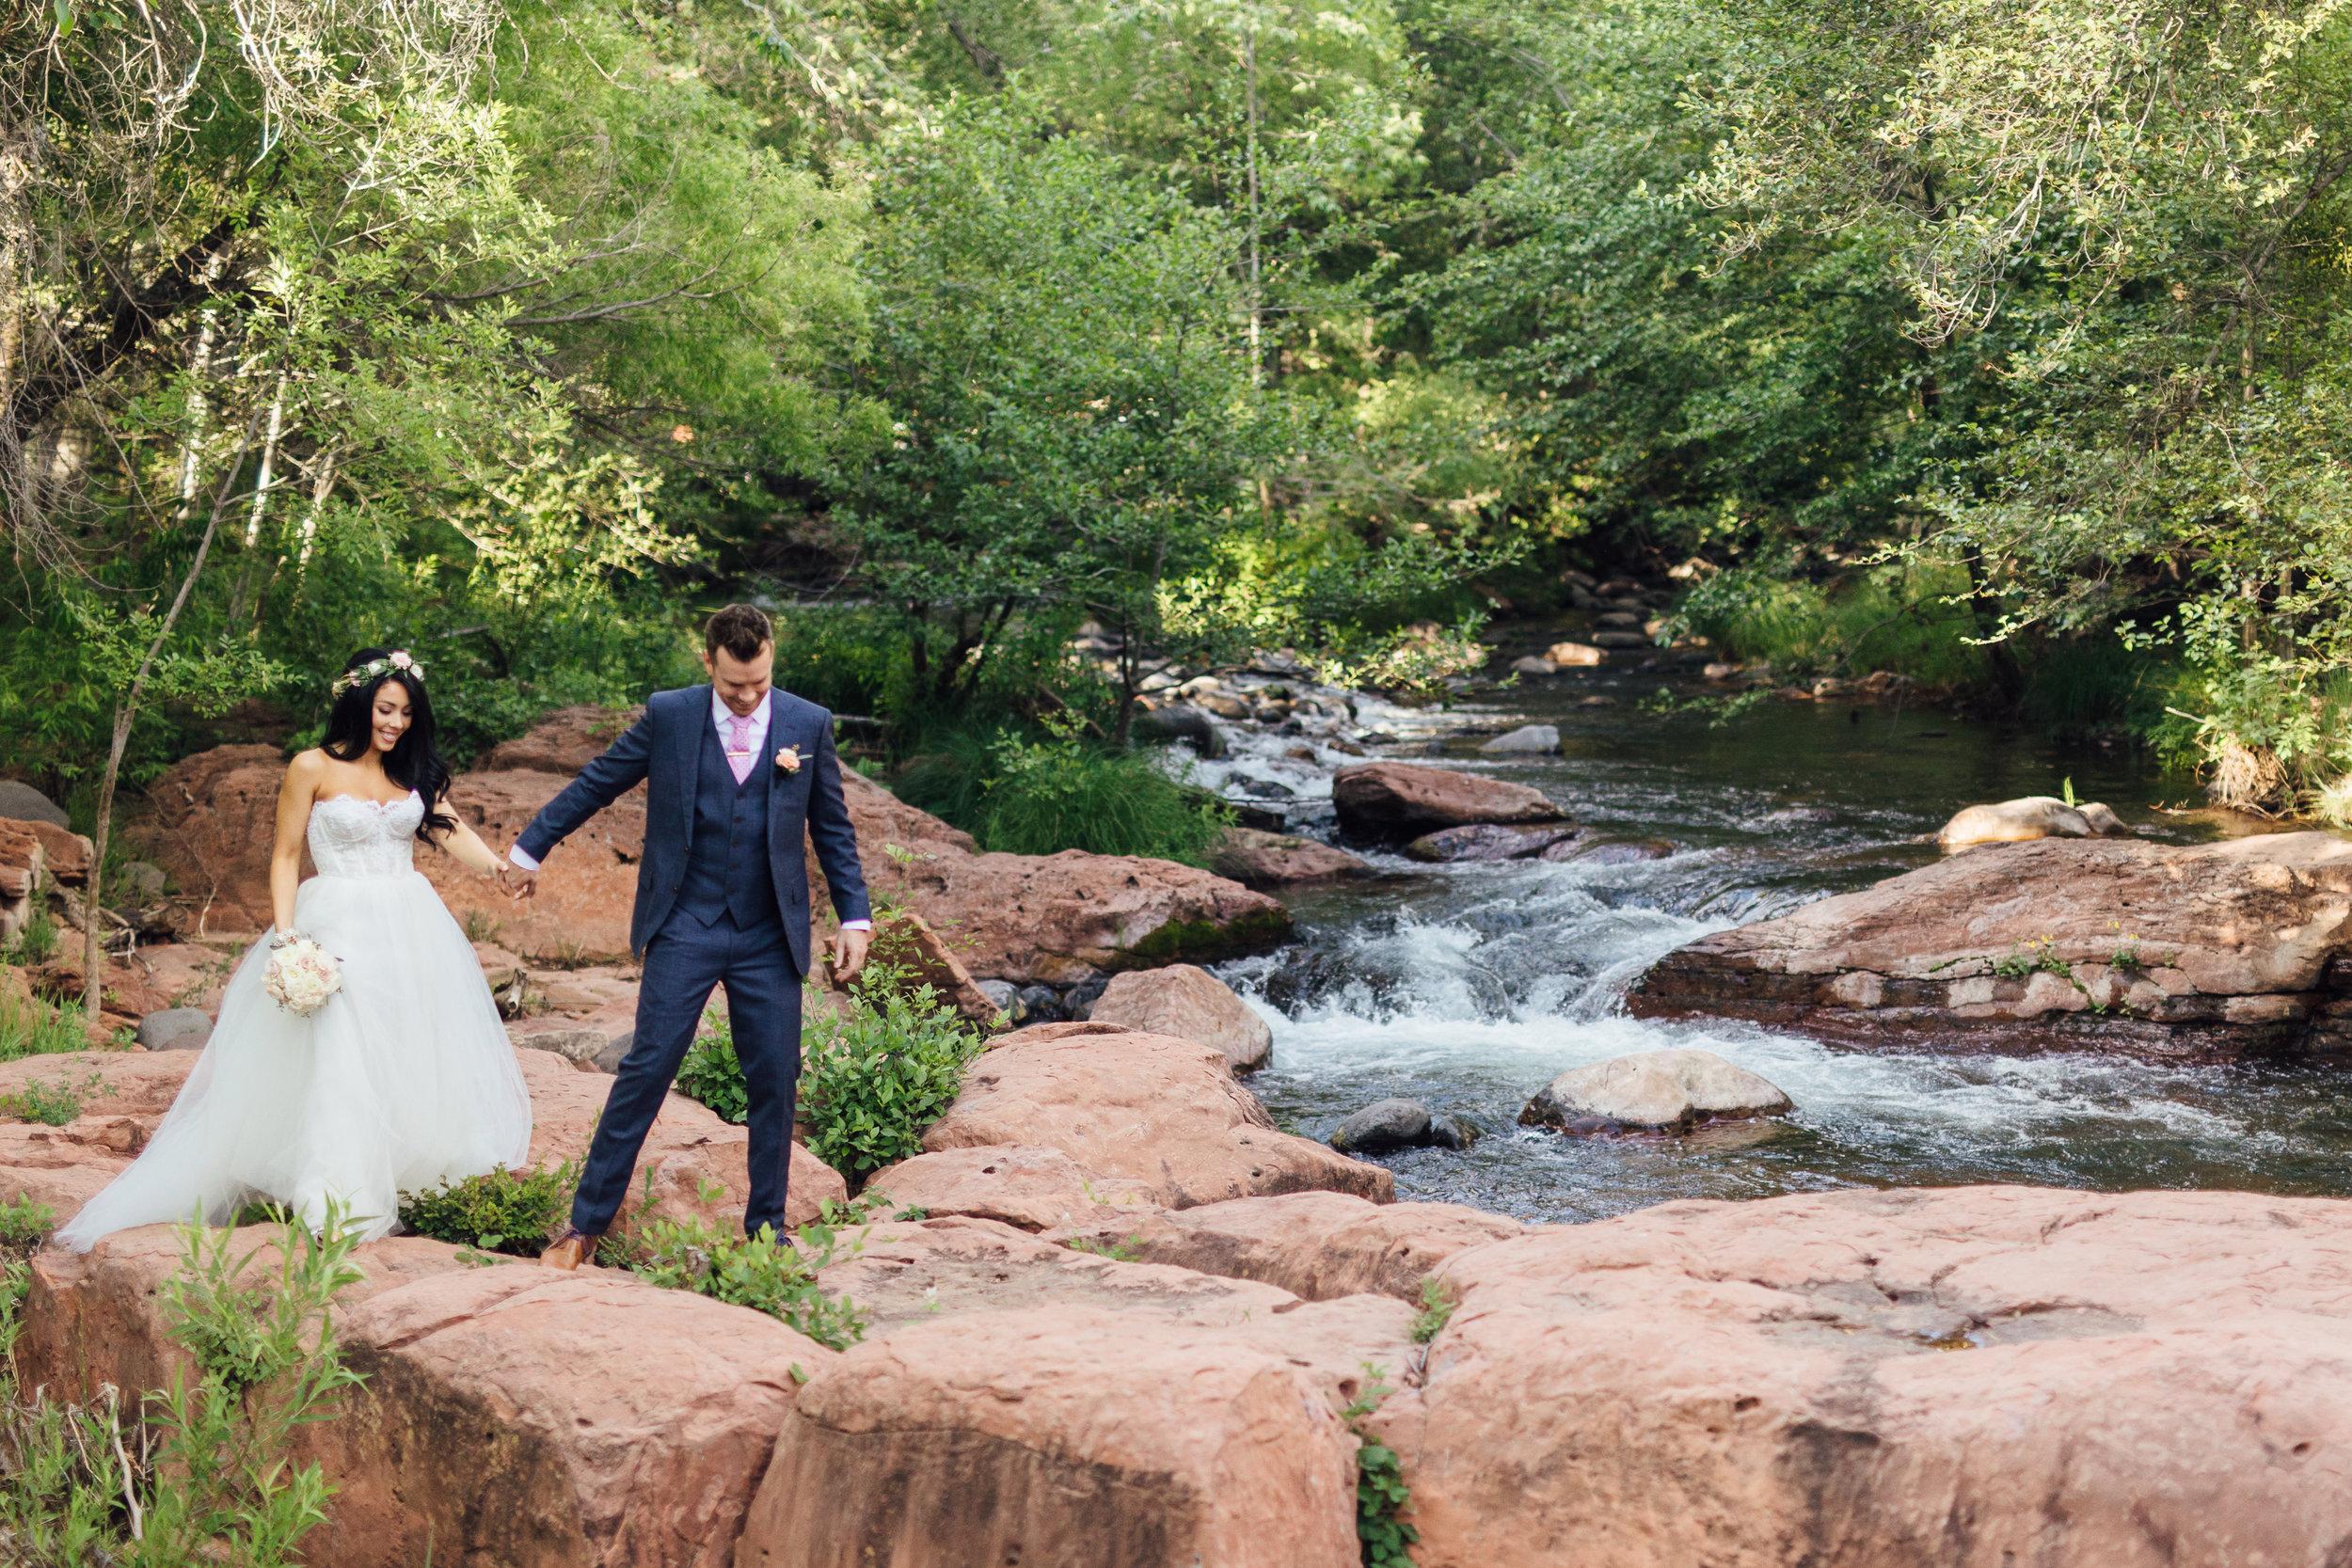 LMW-Sedona-lauberge-wedding-7450.jpg